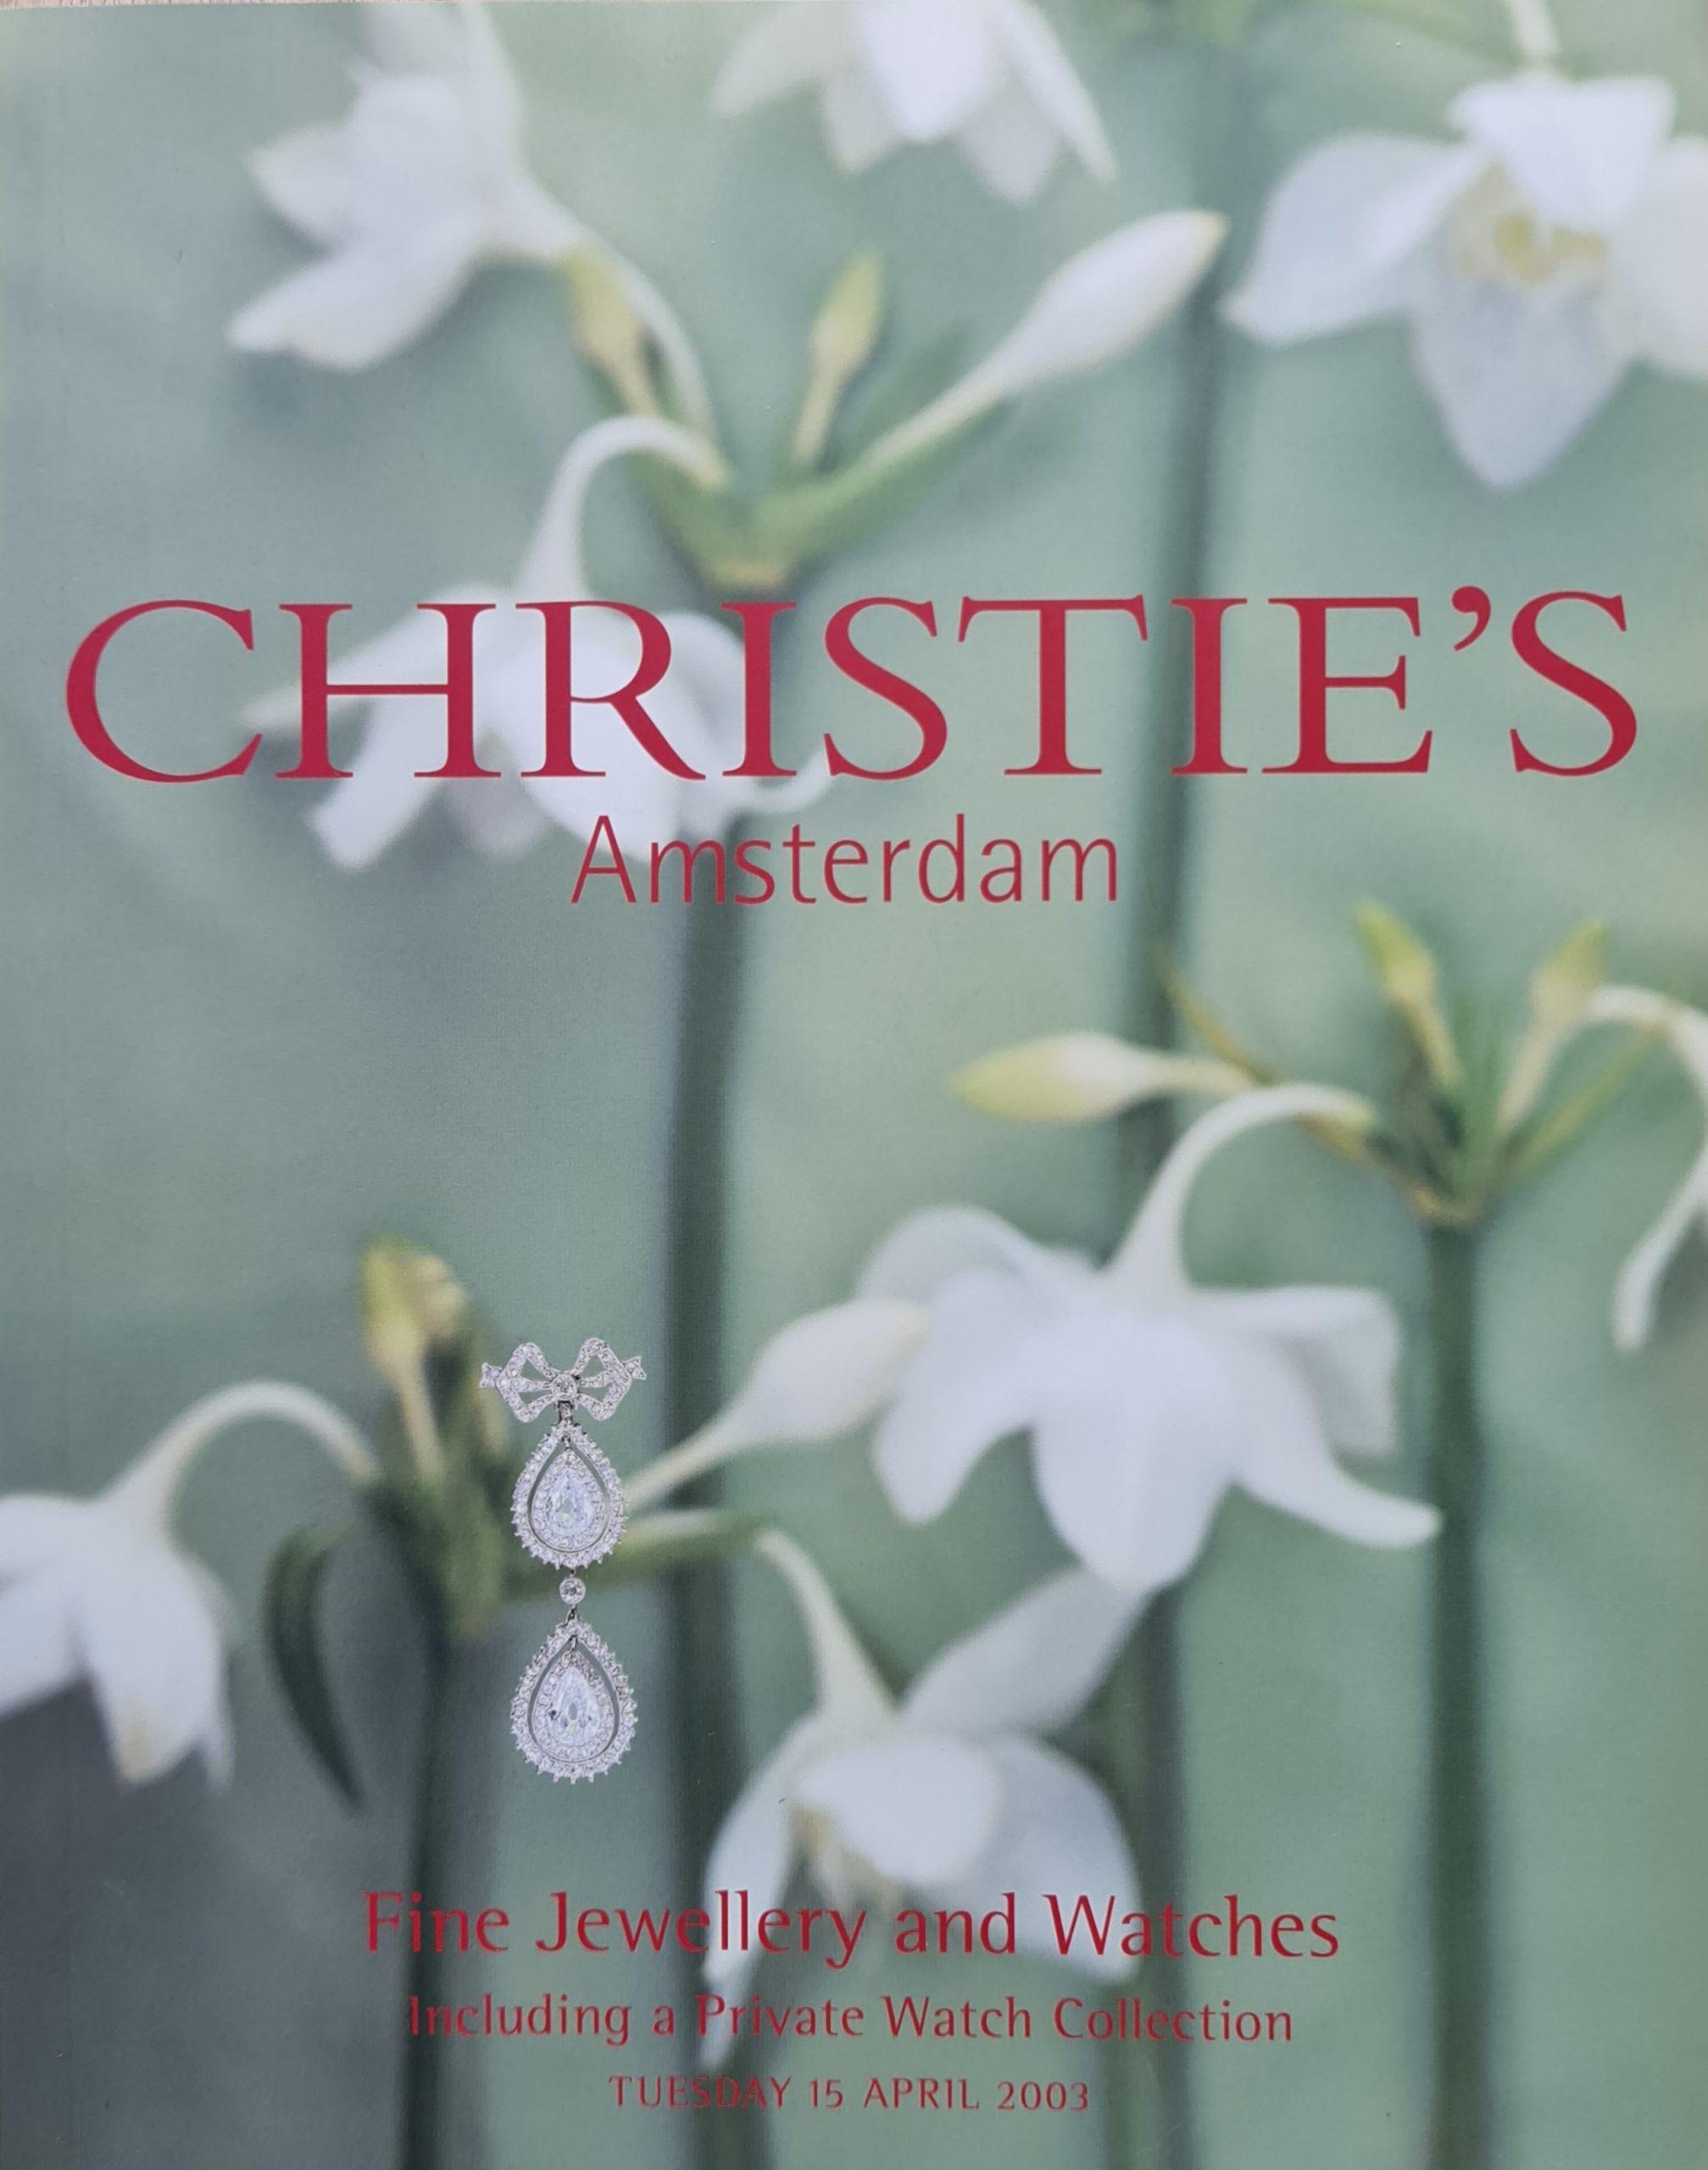 Christie's Amsterdam Veilinggids Fine jewellery and watches Veilingdatum 15 april 2003 skoander.com